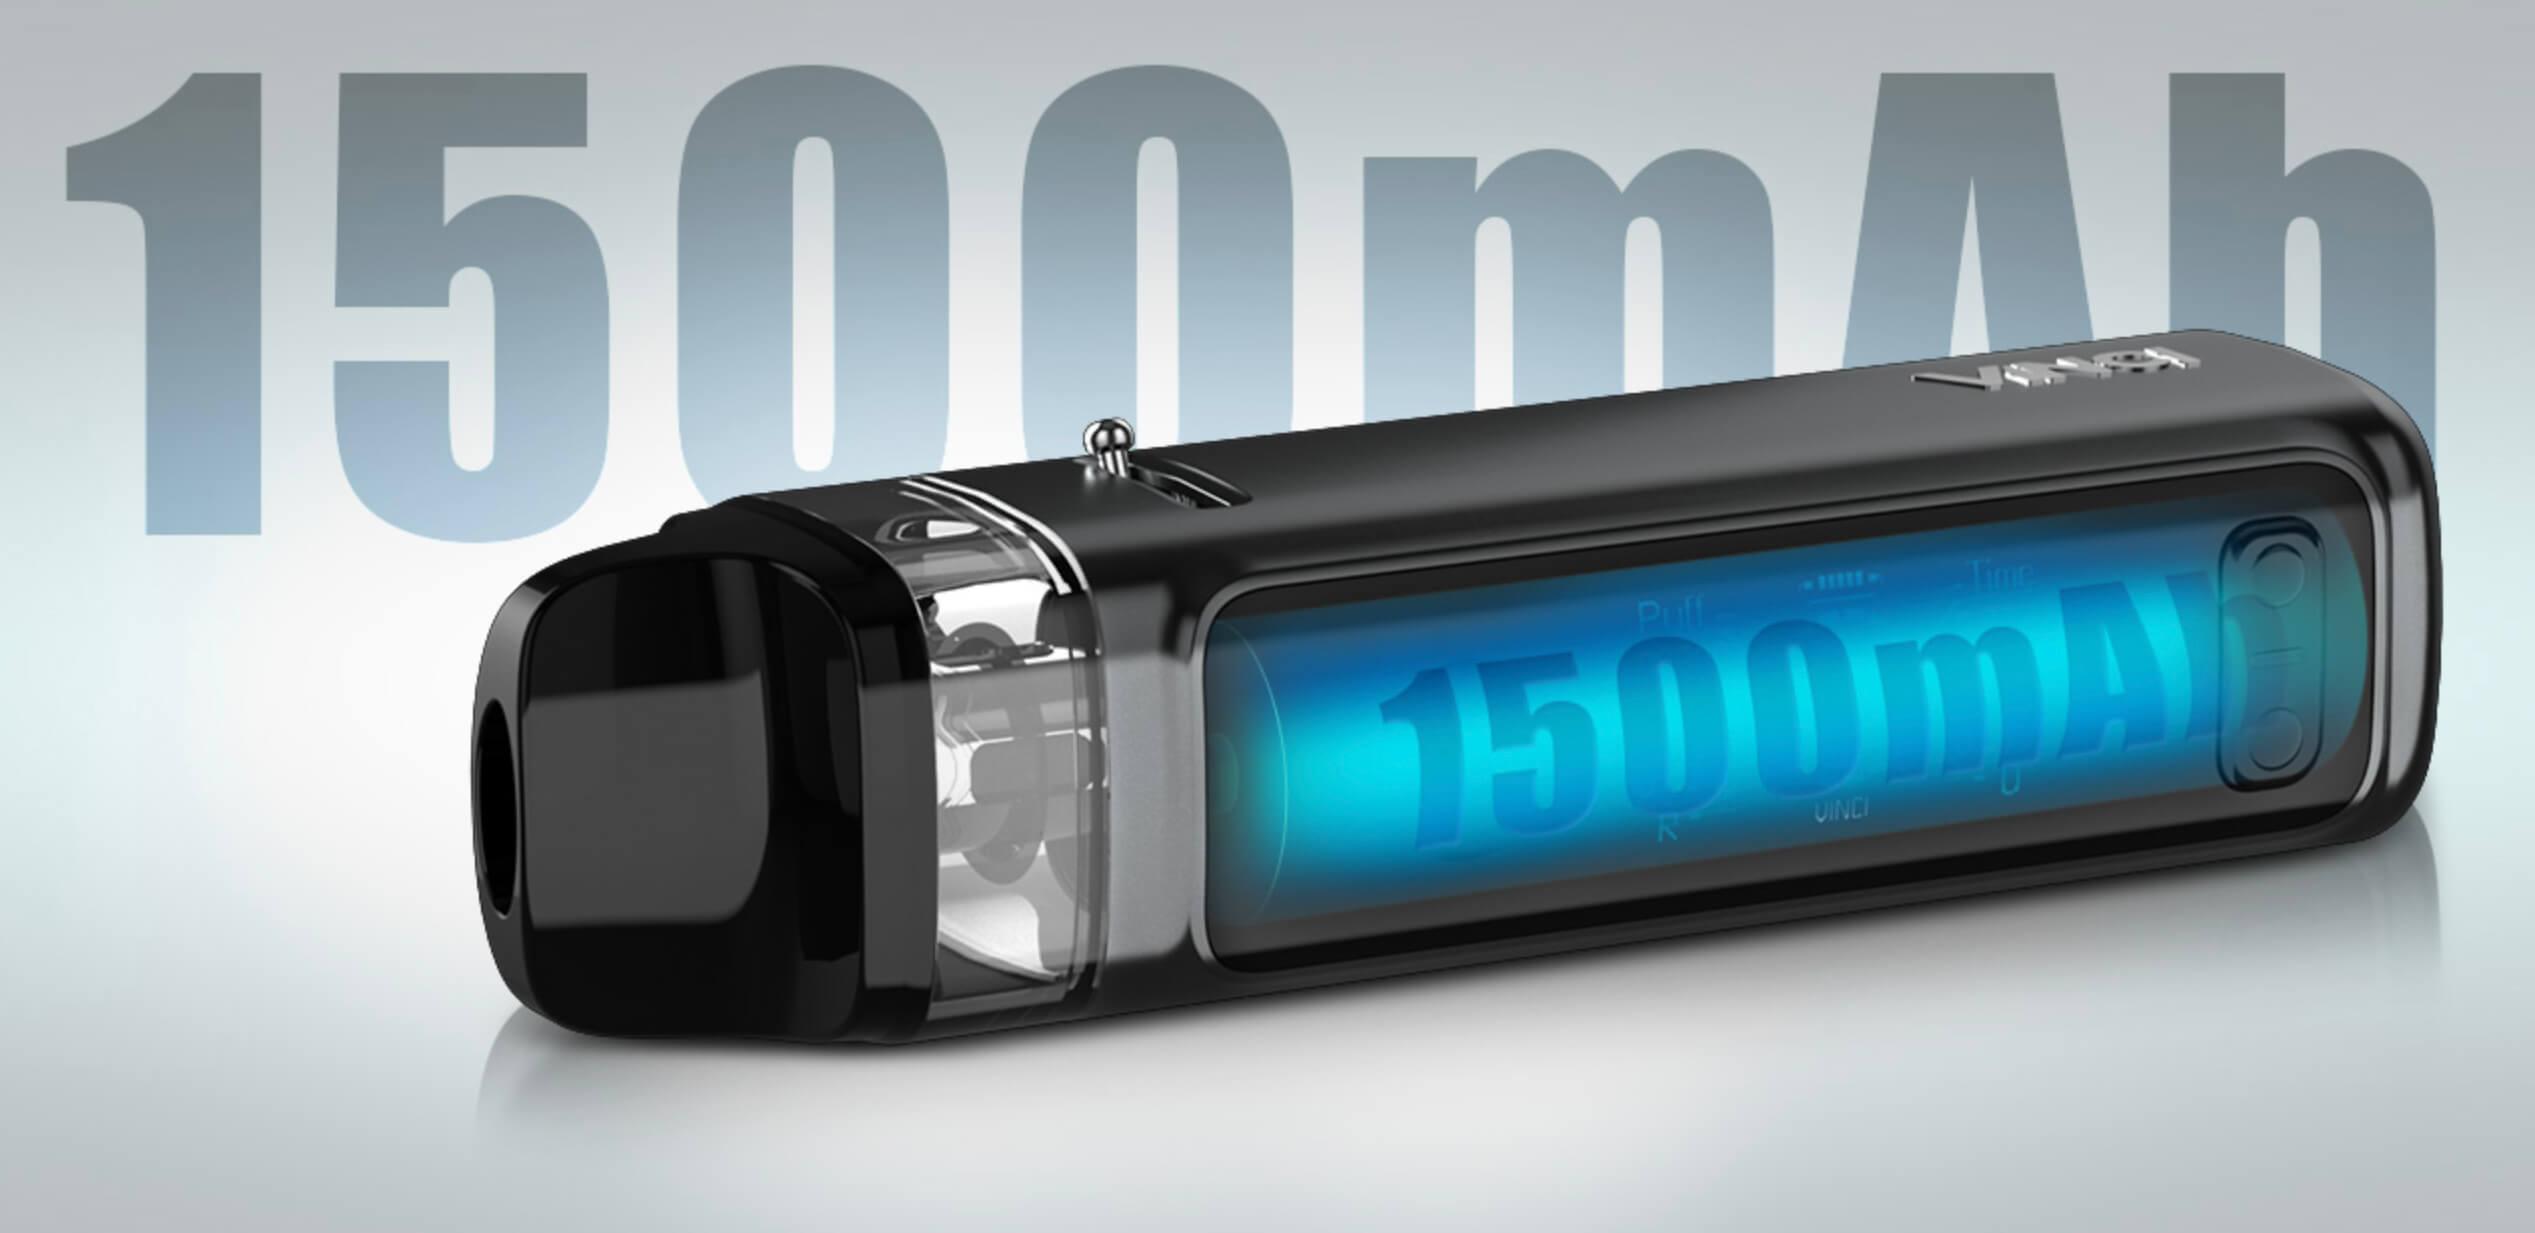 Kit Vinci 2 batterie